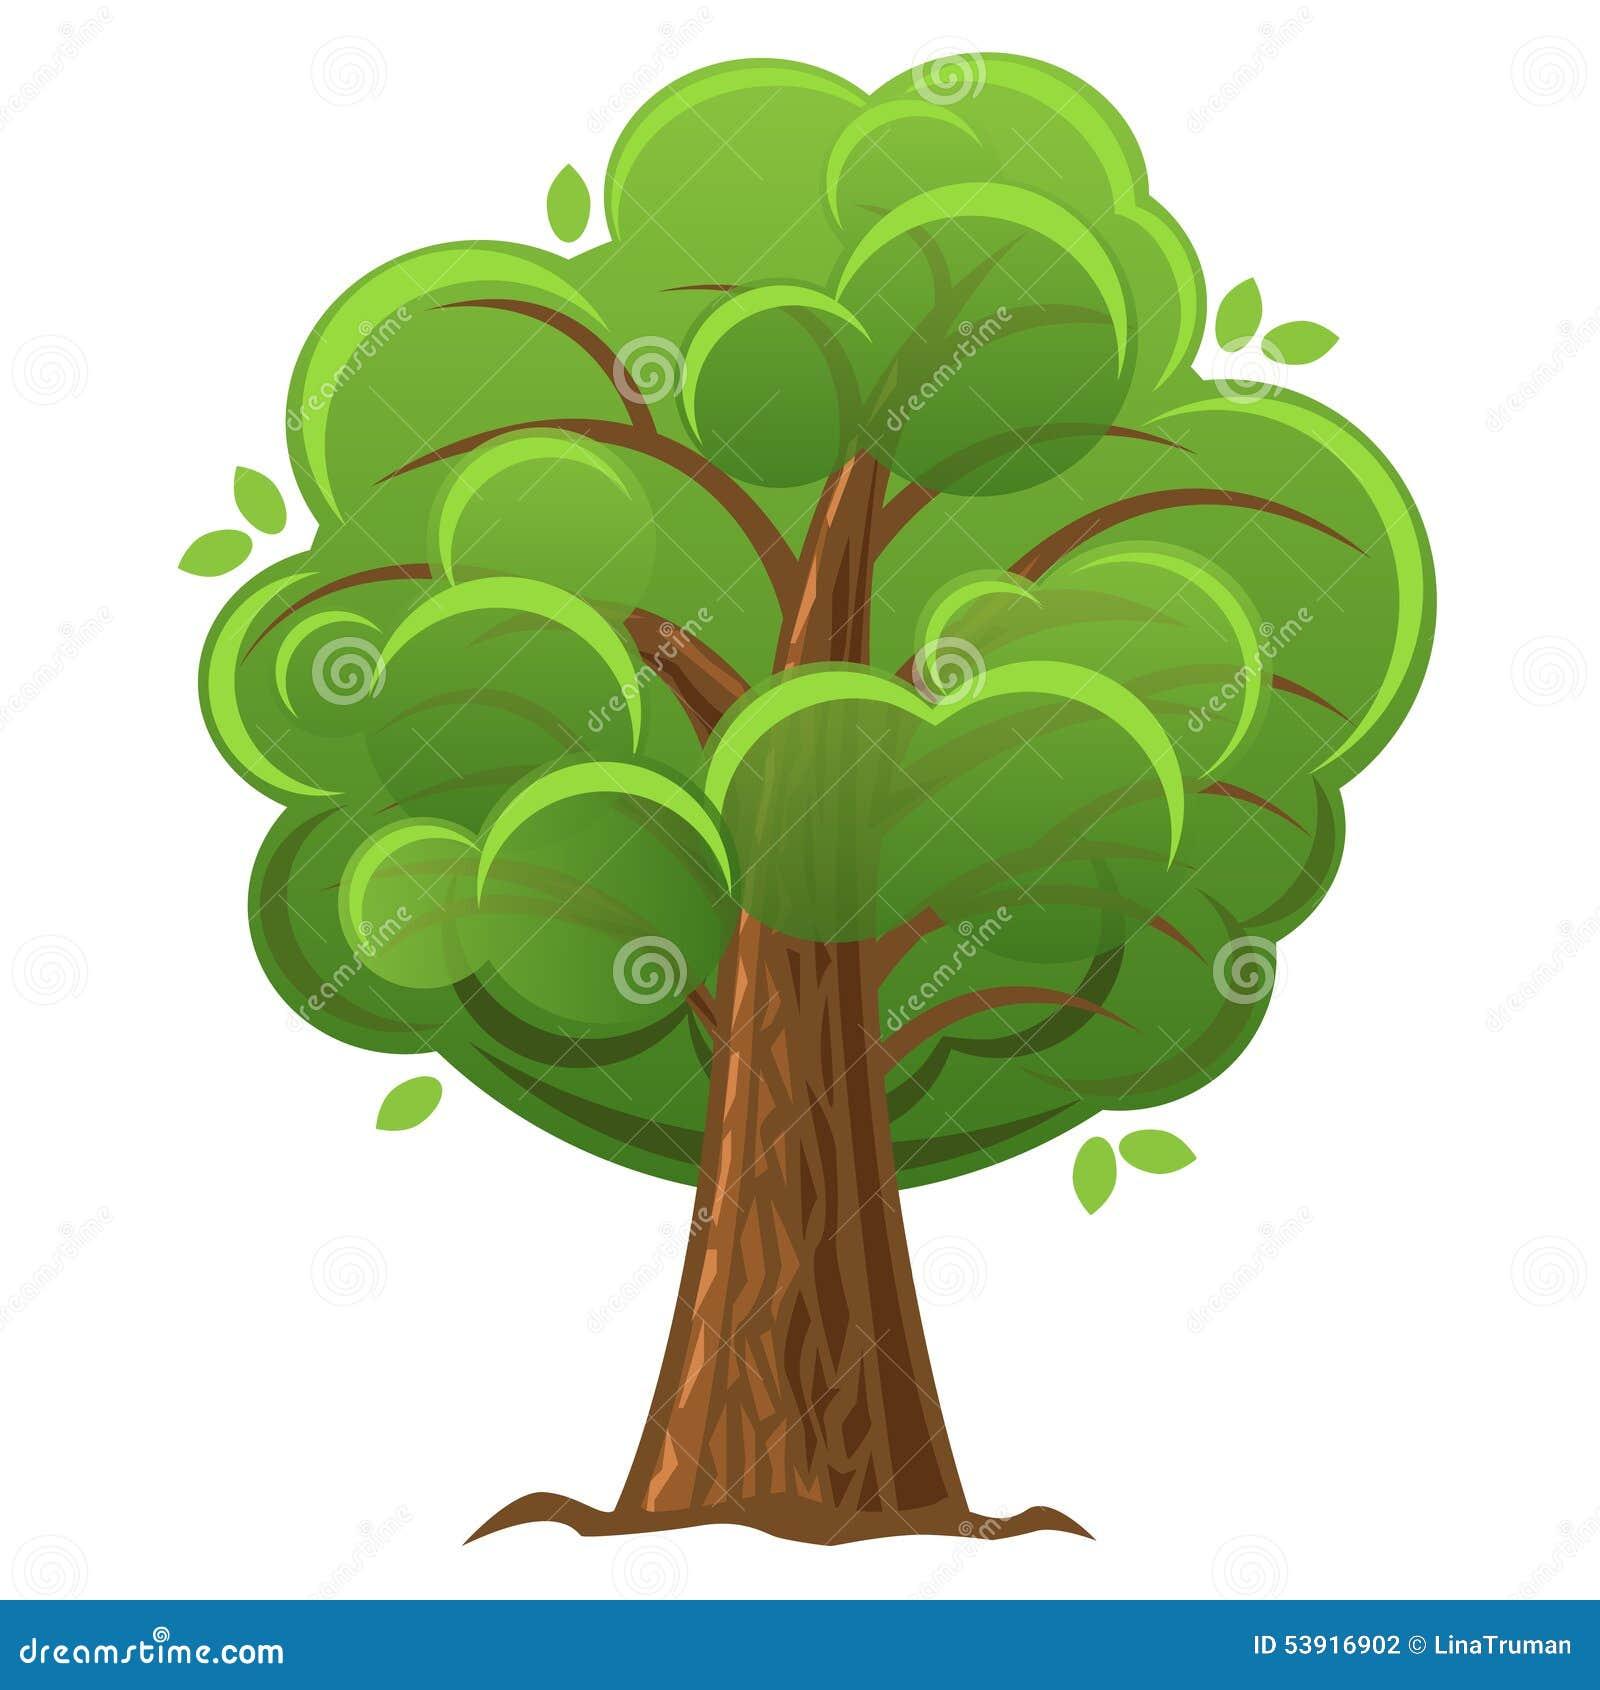 Tree Oak Illustration Cartoon Stock Illustration - Illustration of ...